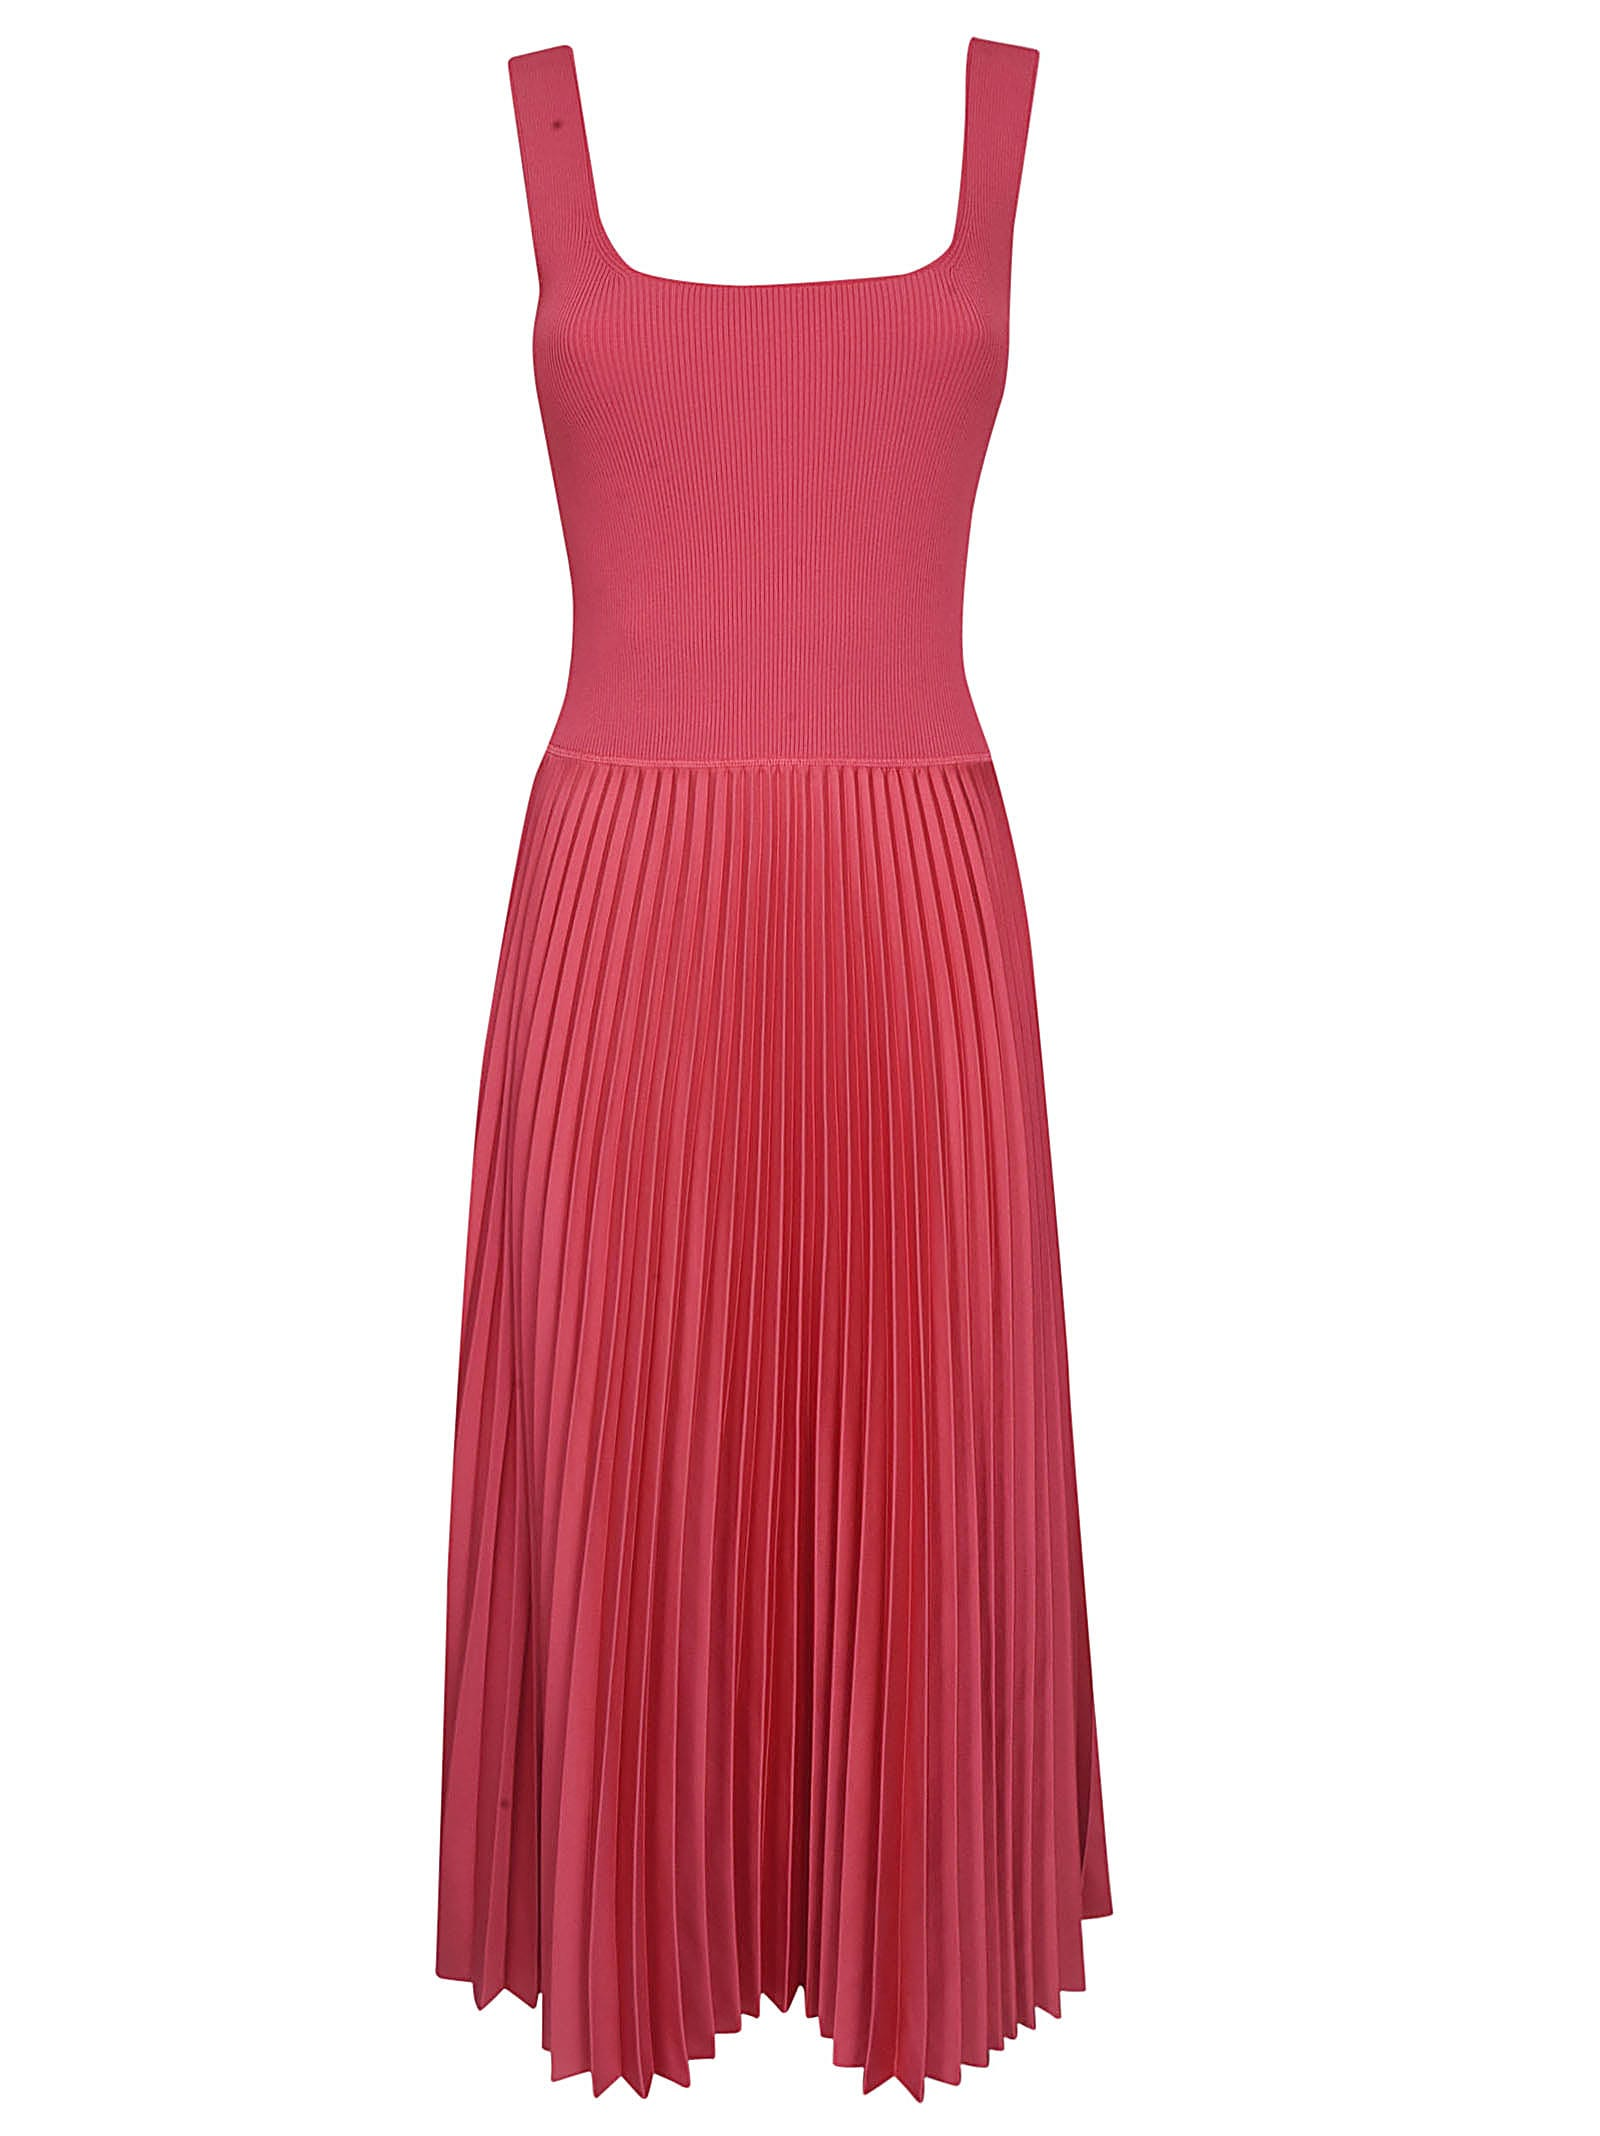 Theory Skirt Pleat Dress